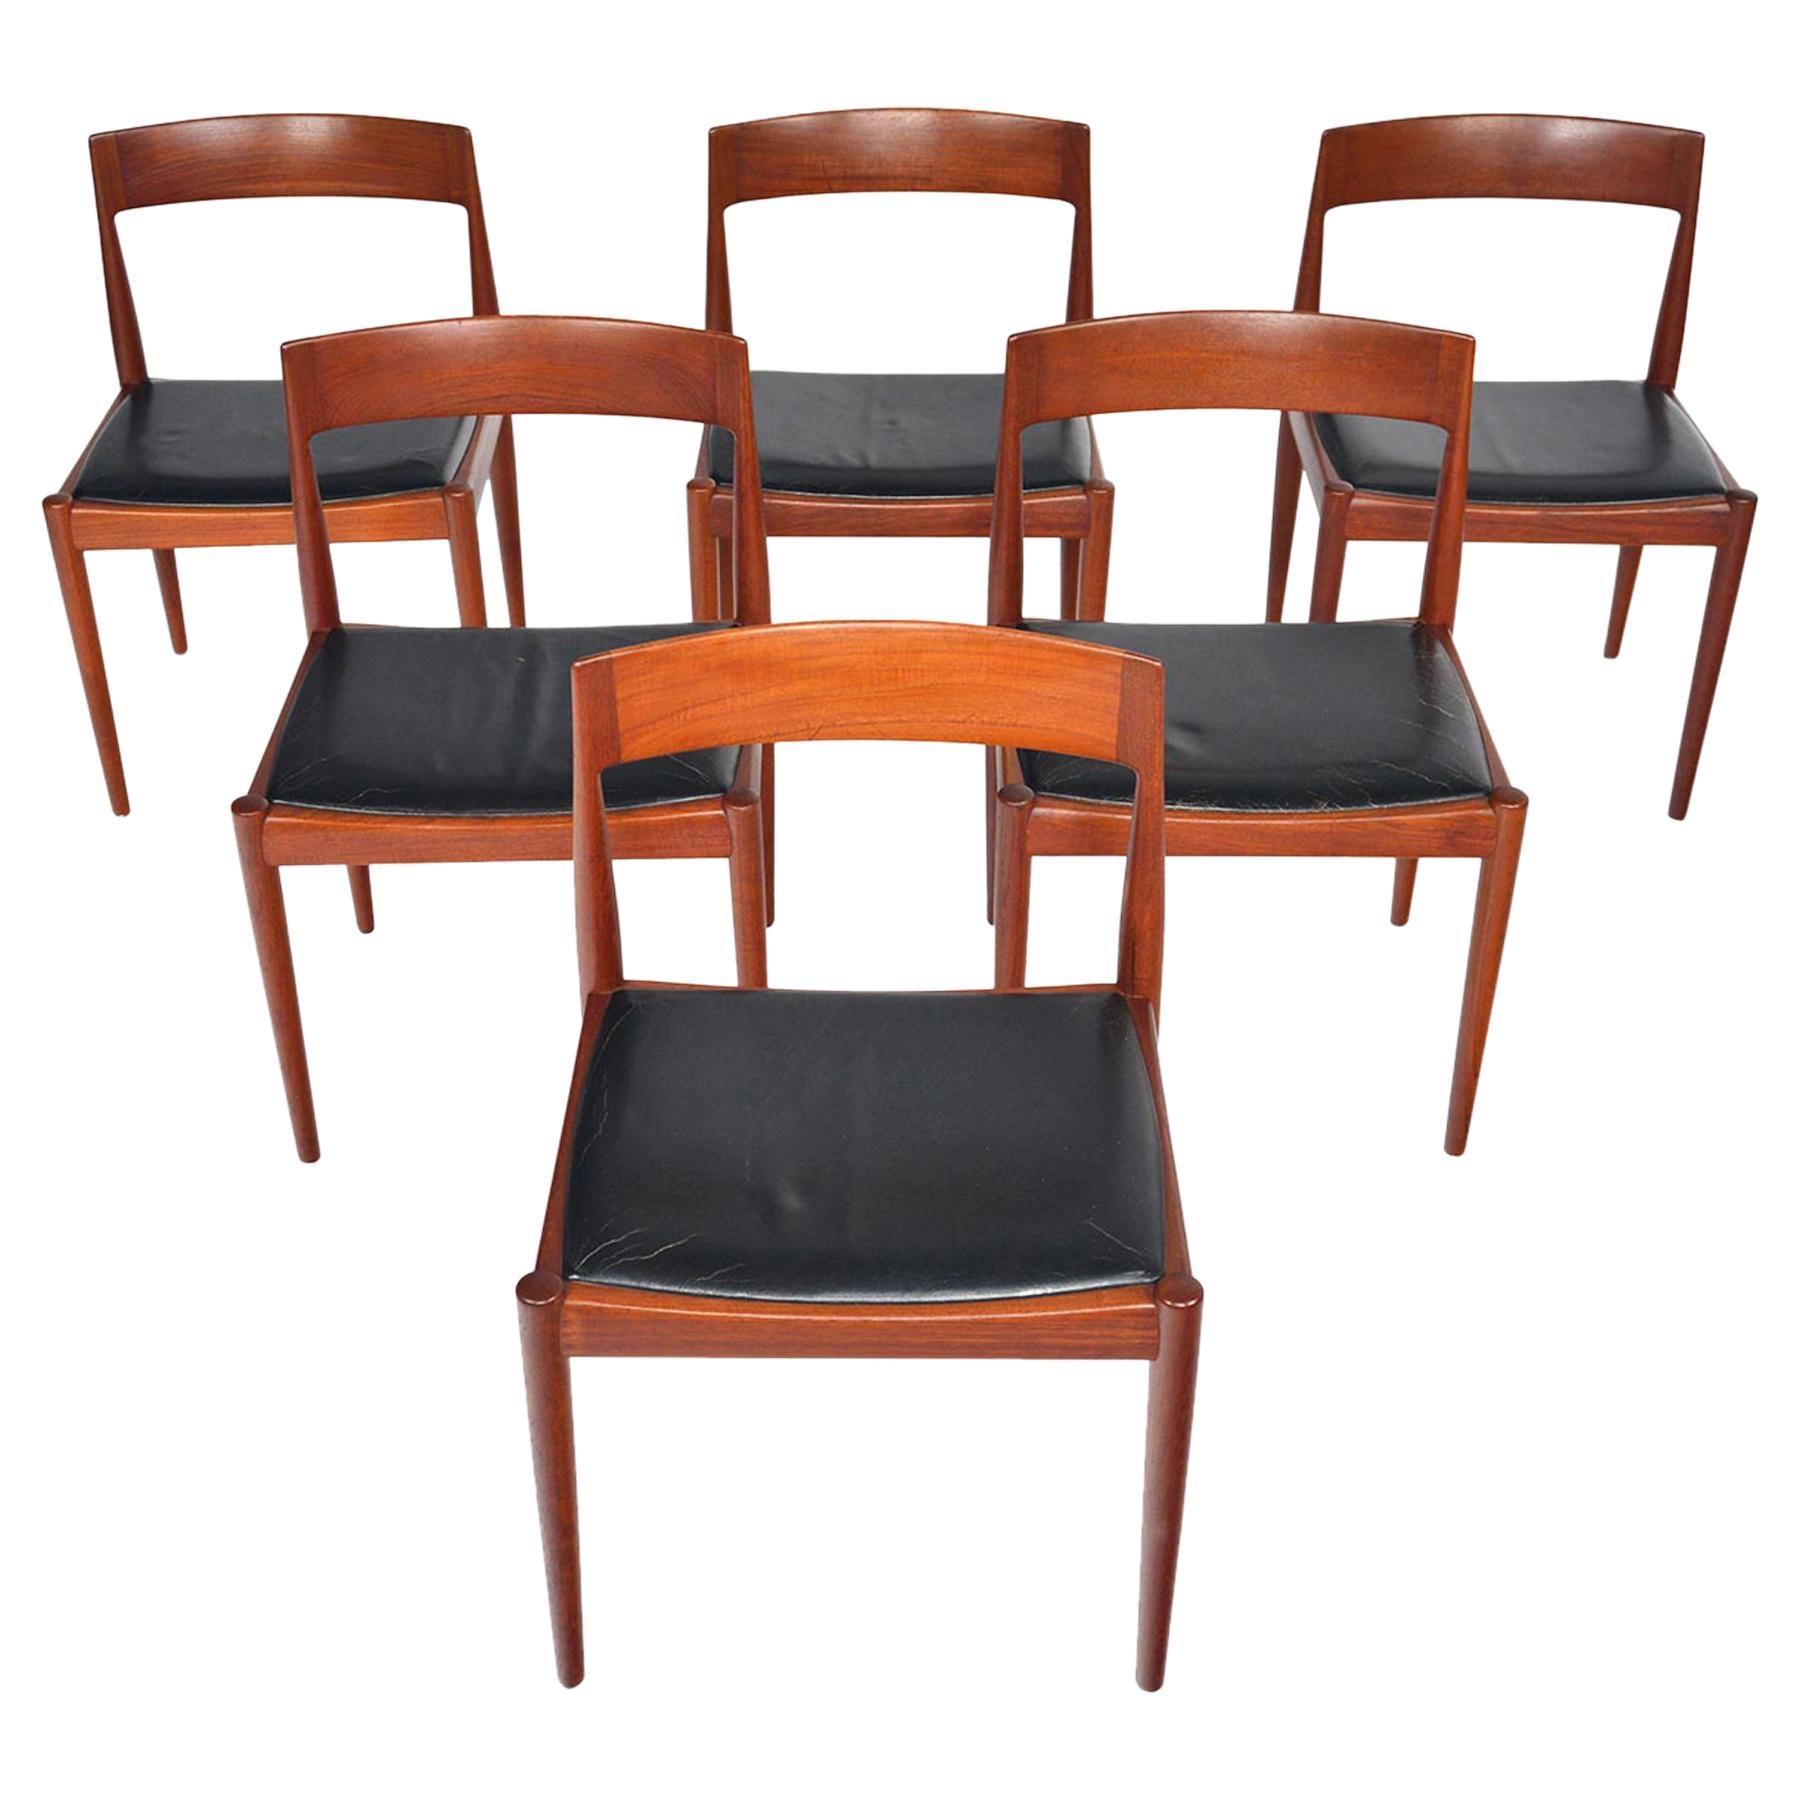 Set of Six Kai Kristiansen for Fritz Hansen Teak Dining Chairs